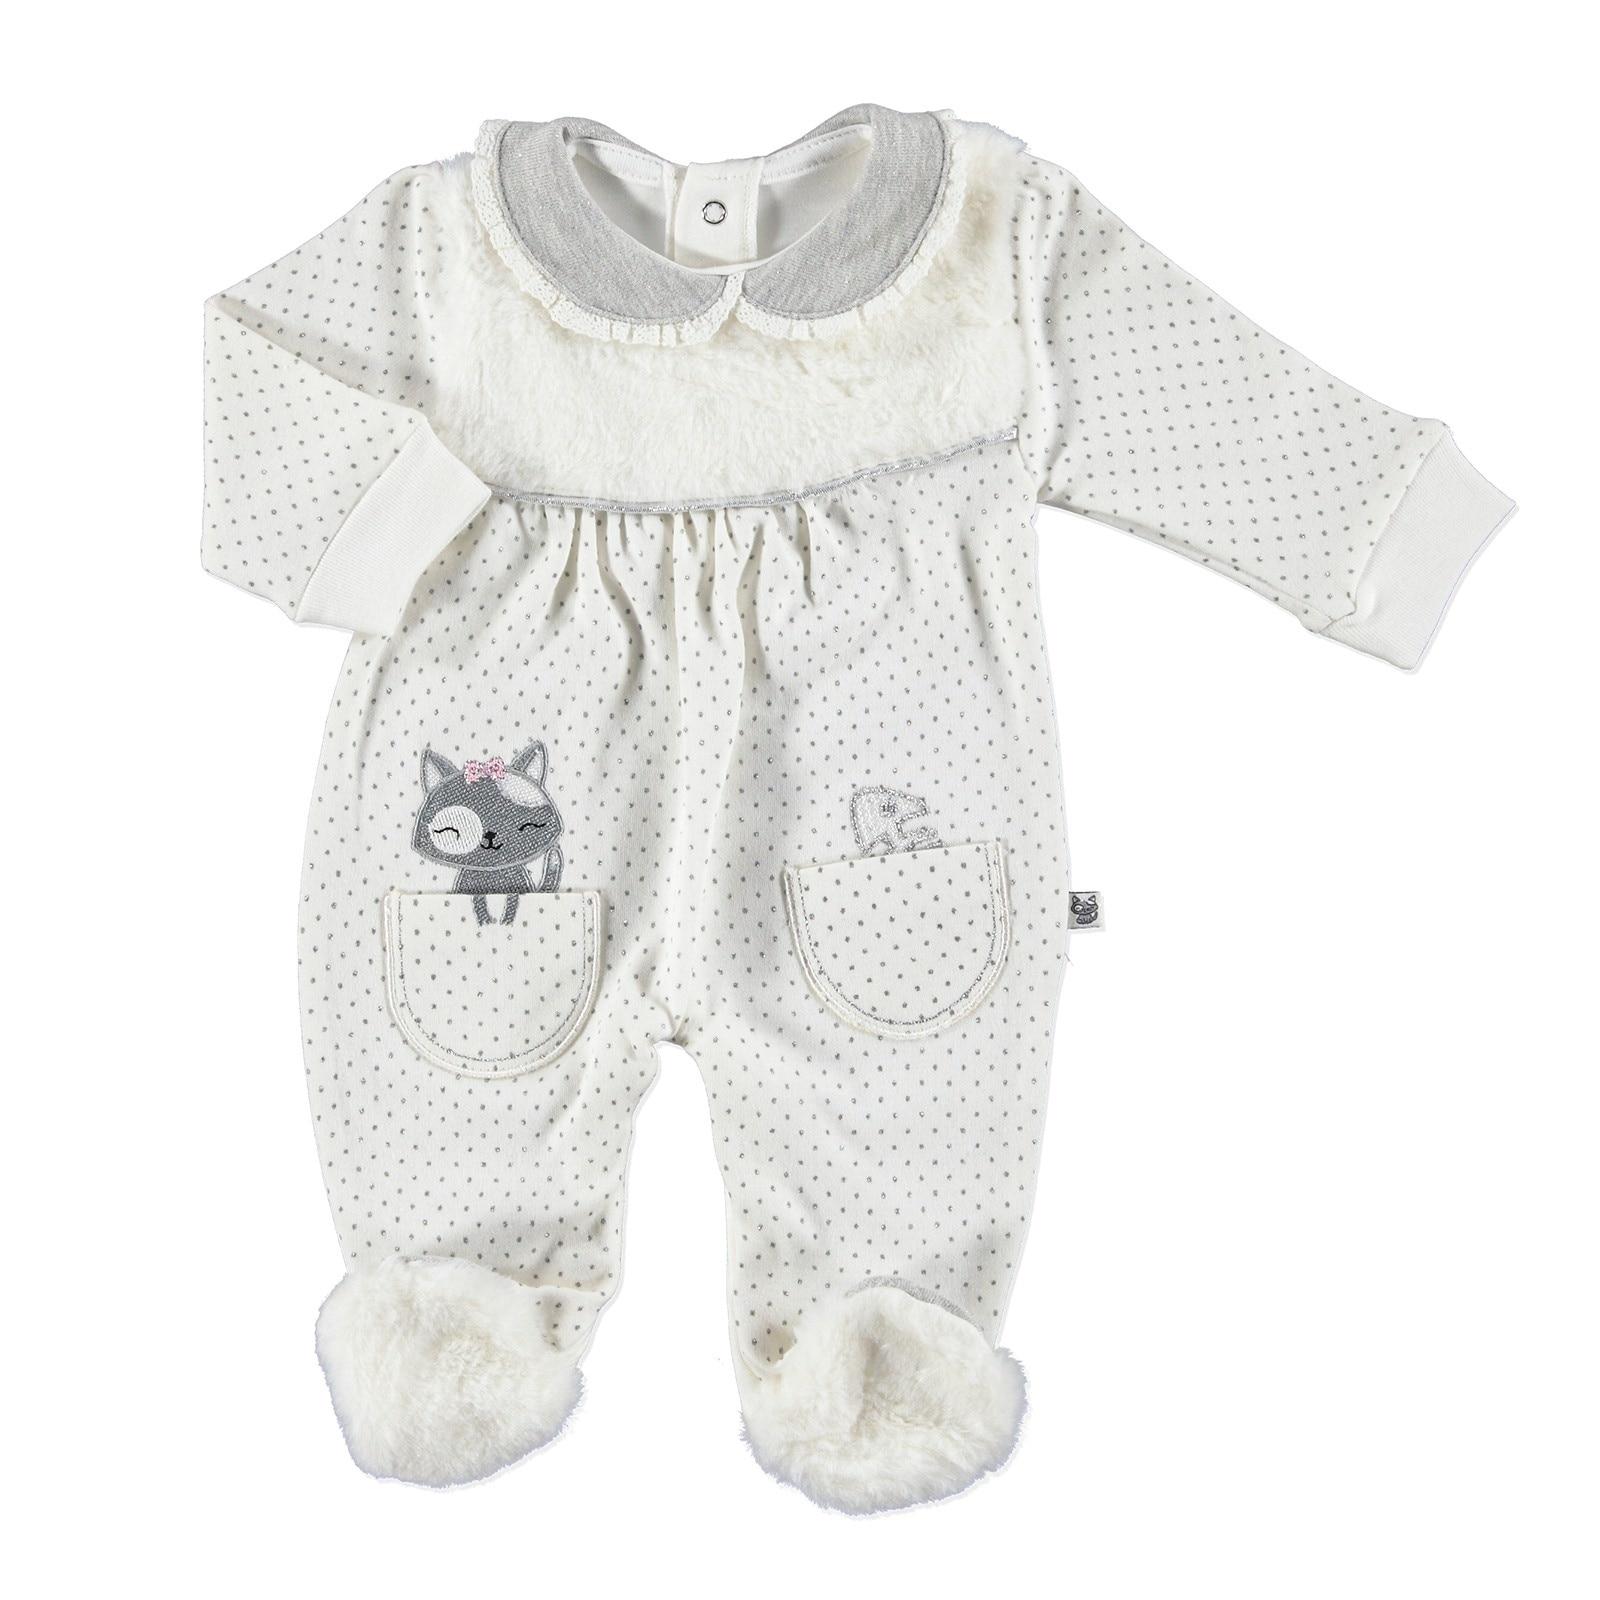 Ebebek Mymio Kitty Girl Peter Pan Collar Baby Footed Romper